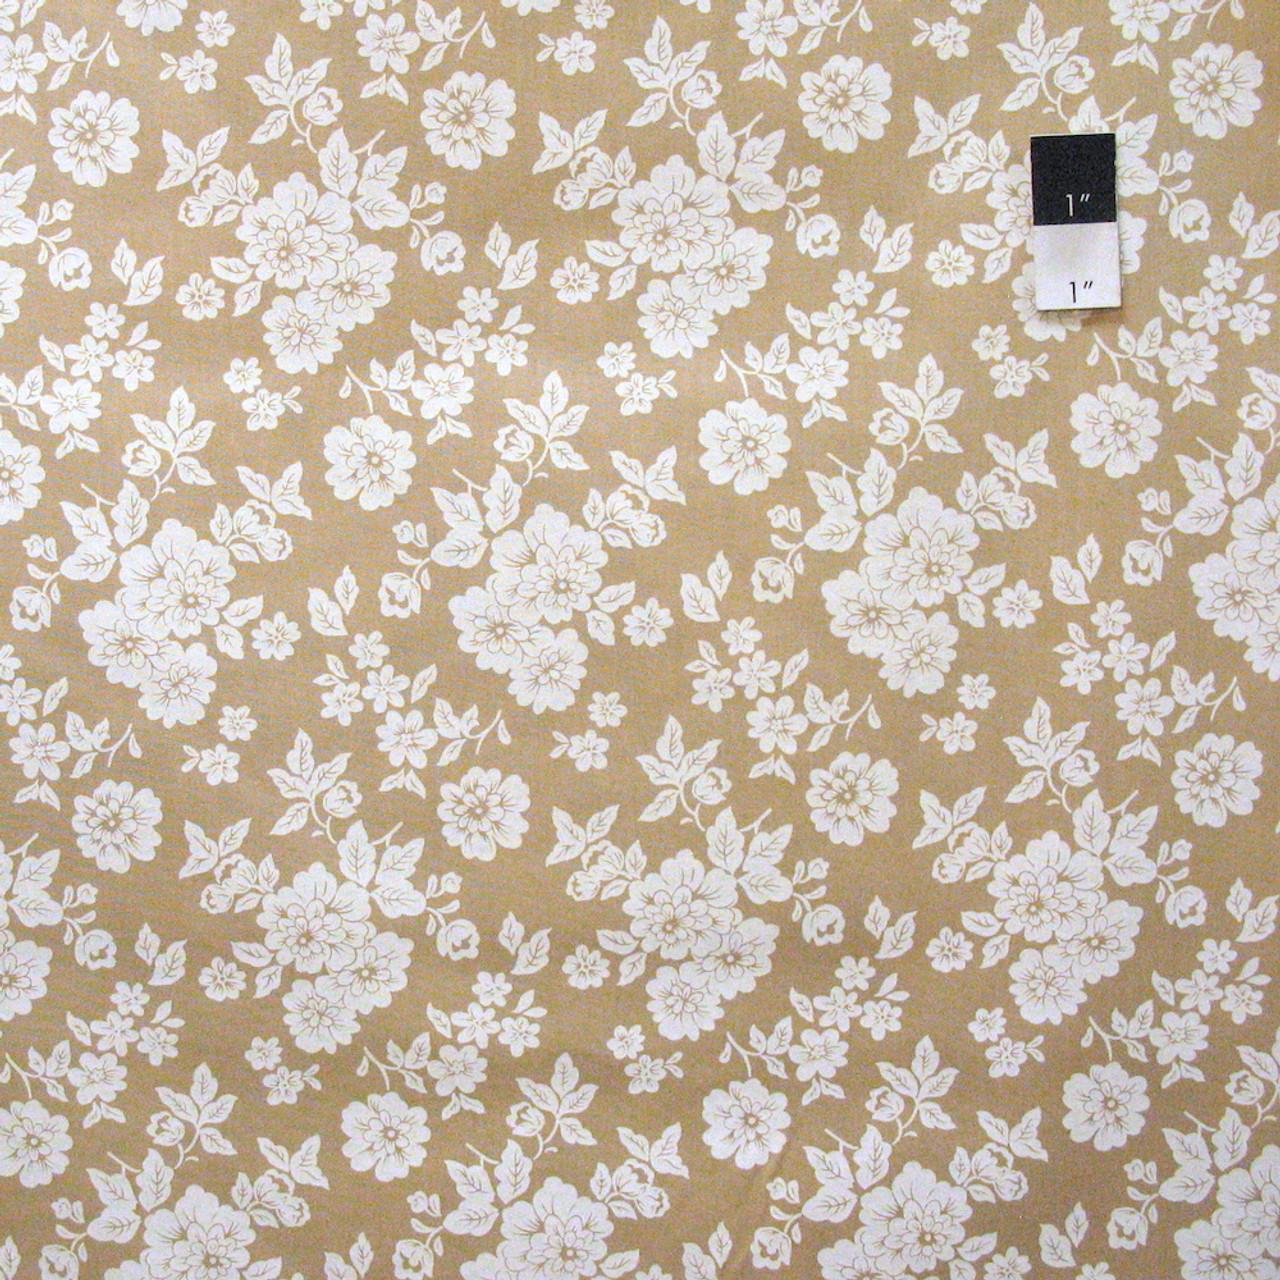 Snapshot BTY Verna Mosquera FreeSpirit Blooming Border Stripe Brown Floral